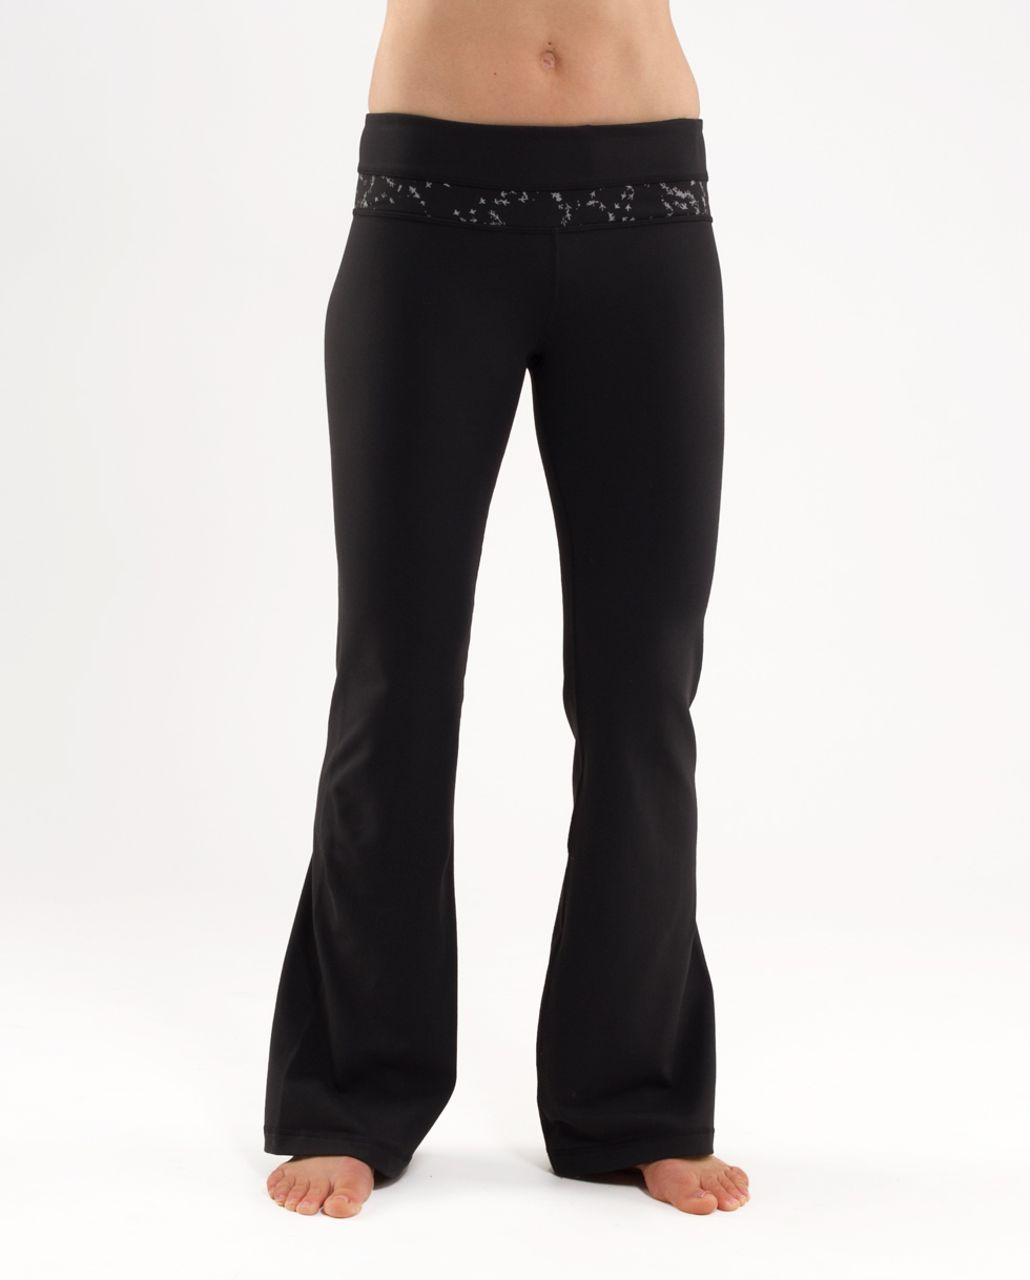 Lululemon Groove Pant (Regular) - Black /  Silver Pitter Patter Reflective